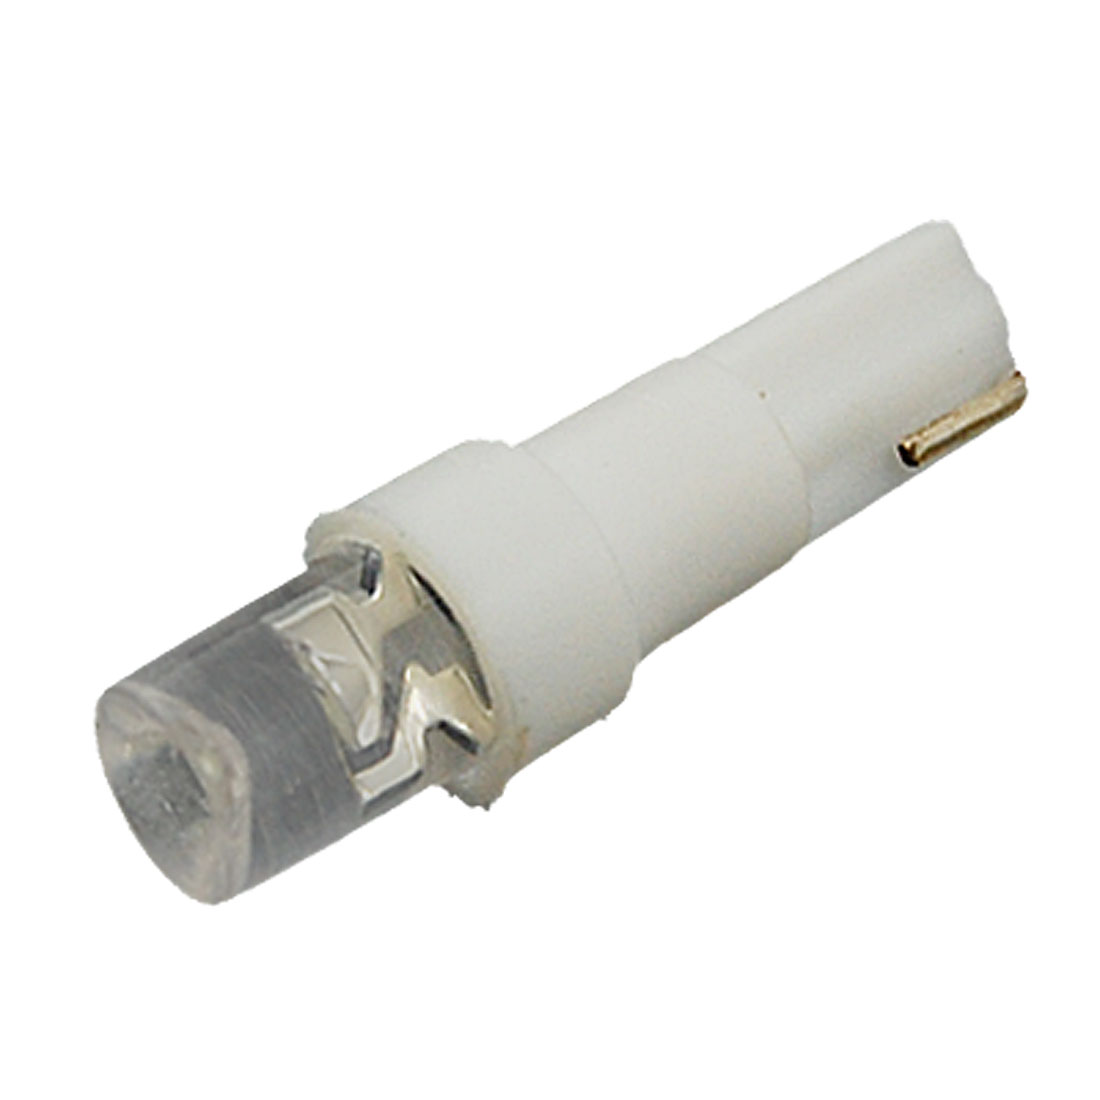 4 Pcs Auto Car White Lamp T5 LED Backup Dashboard Light Bulbs